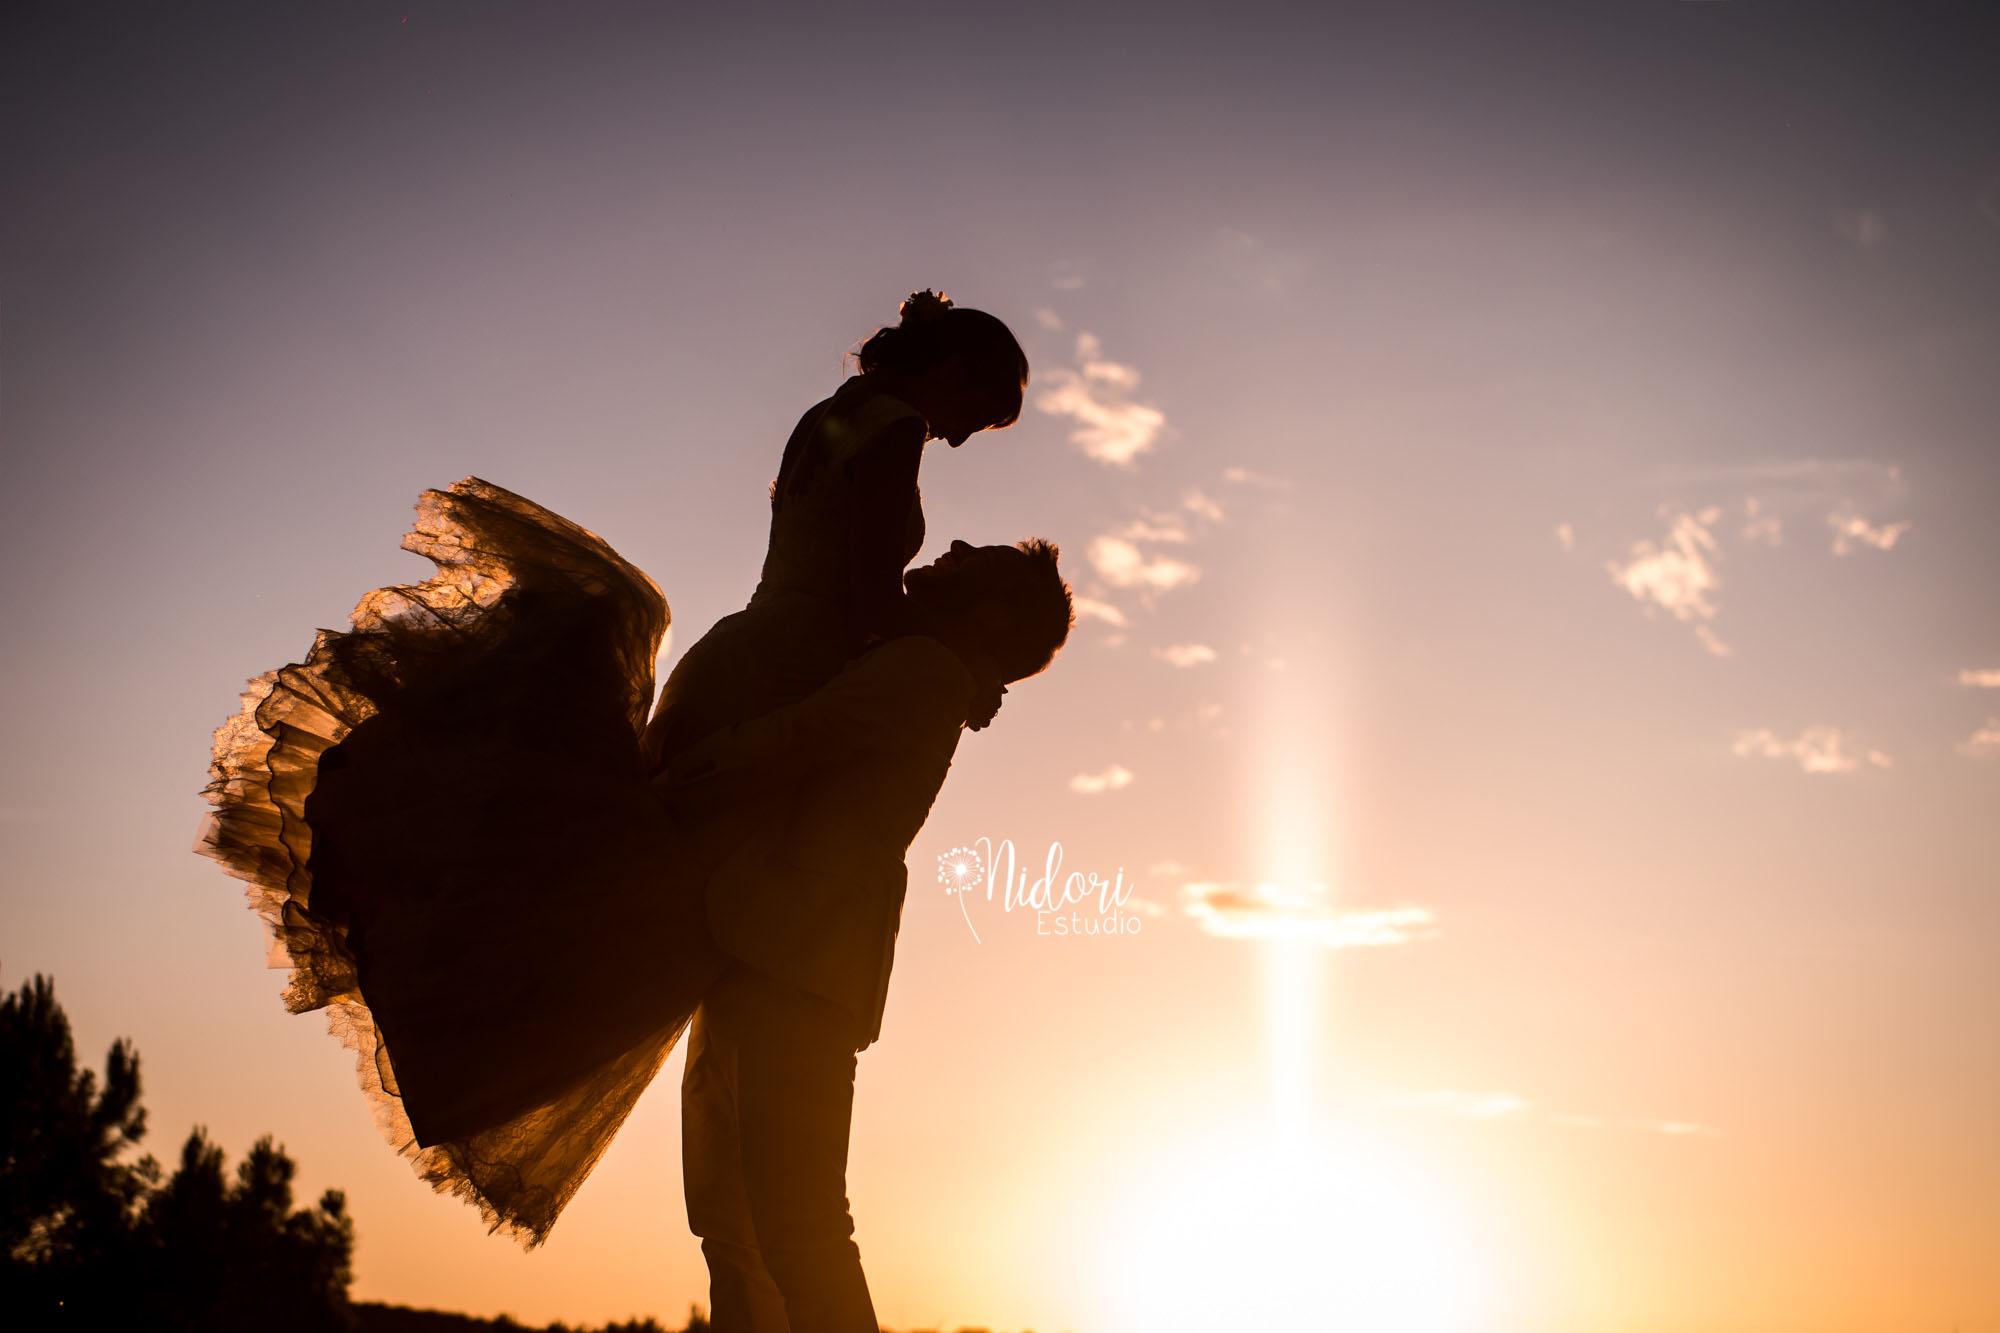 fotos-de-boda-reportaje-novios-fotografia-boda-nidoriestudio-fotos-valencia-almazora-castellon-españa-spain-017